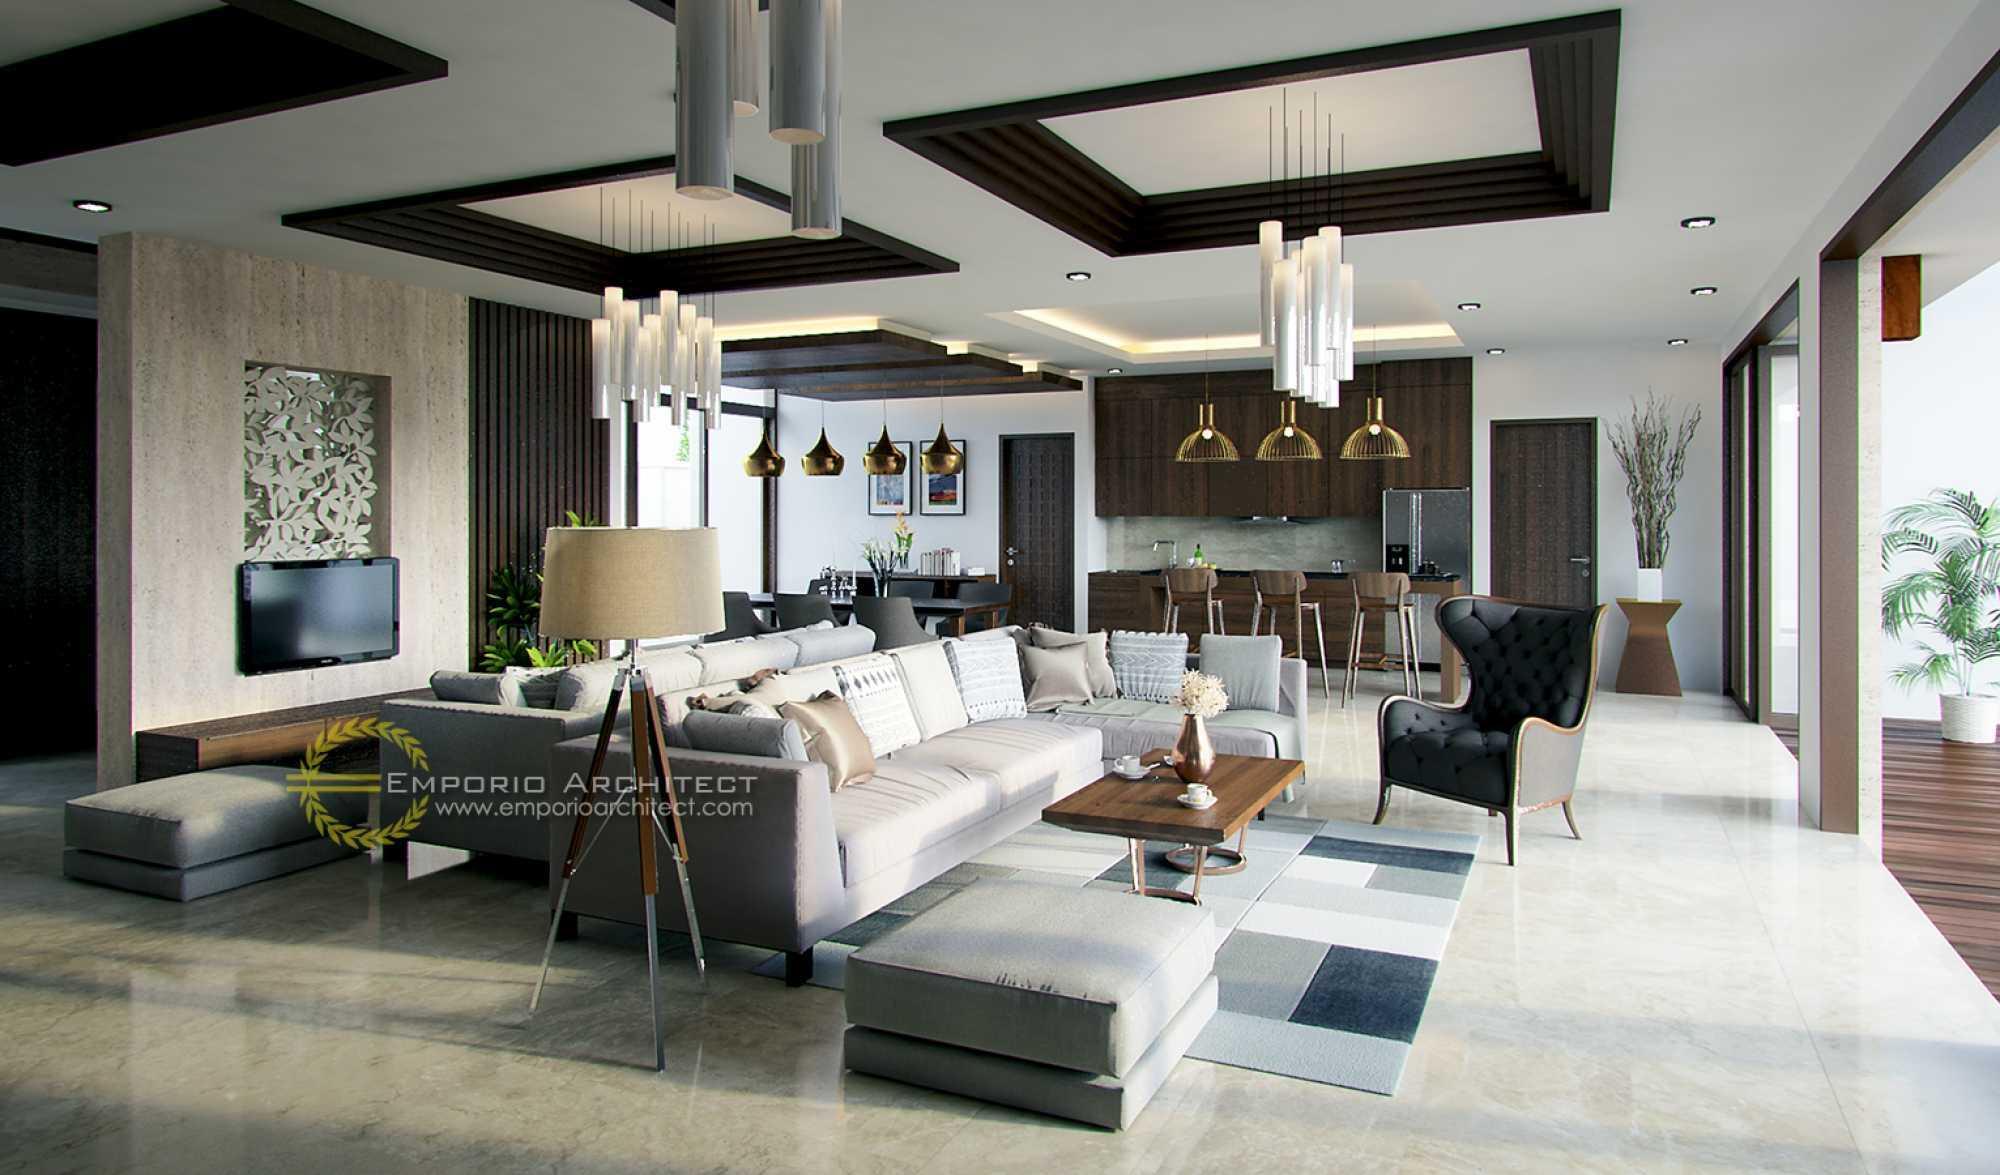 Emporio Architect Desain Rumah Villa Bali Tropis 233 @ Bekasi Bekasi, Kota Bks, Jawa Barat, Indonesia Bekasi, Kota Bks, Jawa Barat, Indonesia Emporio-Architect-Desain-Rumah-Villa-Bali-Tropis-233-Bekasi  73042